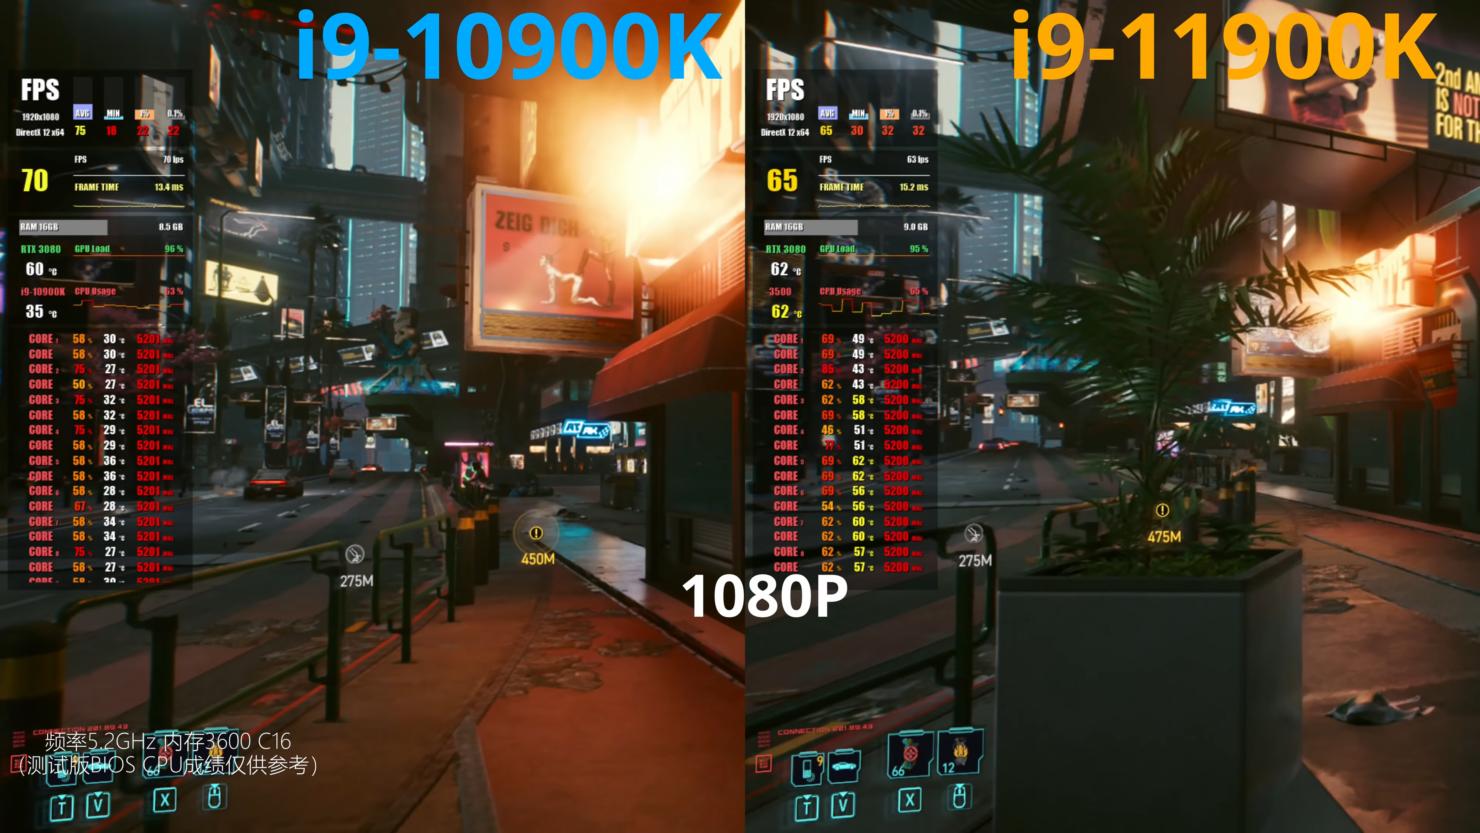 intel-core-i9-11900k-8-core-rocket-lake-vs-core-i9-10900k-10-core-comet-lake-cpu-_-5-2-ghz-overclock-_-cyberpunk-2077